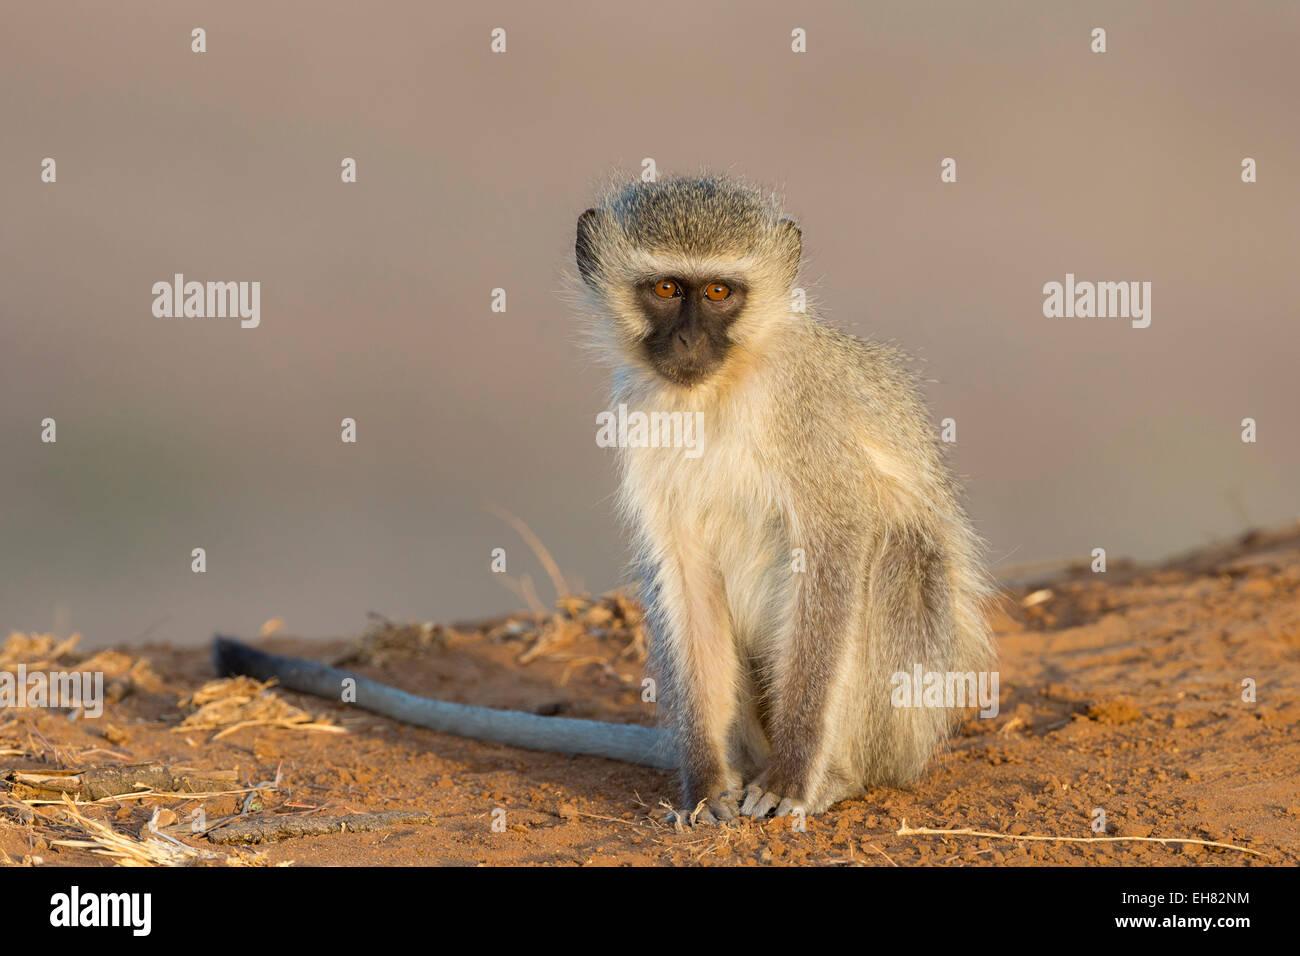 Vervet monkey (Cercopithecus aethiops), Kruger National Park, Sud Africa e Africa Immagini Stock